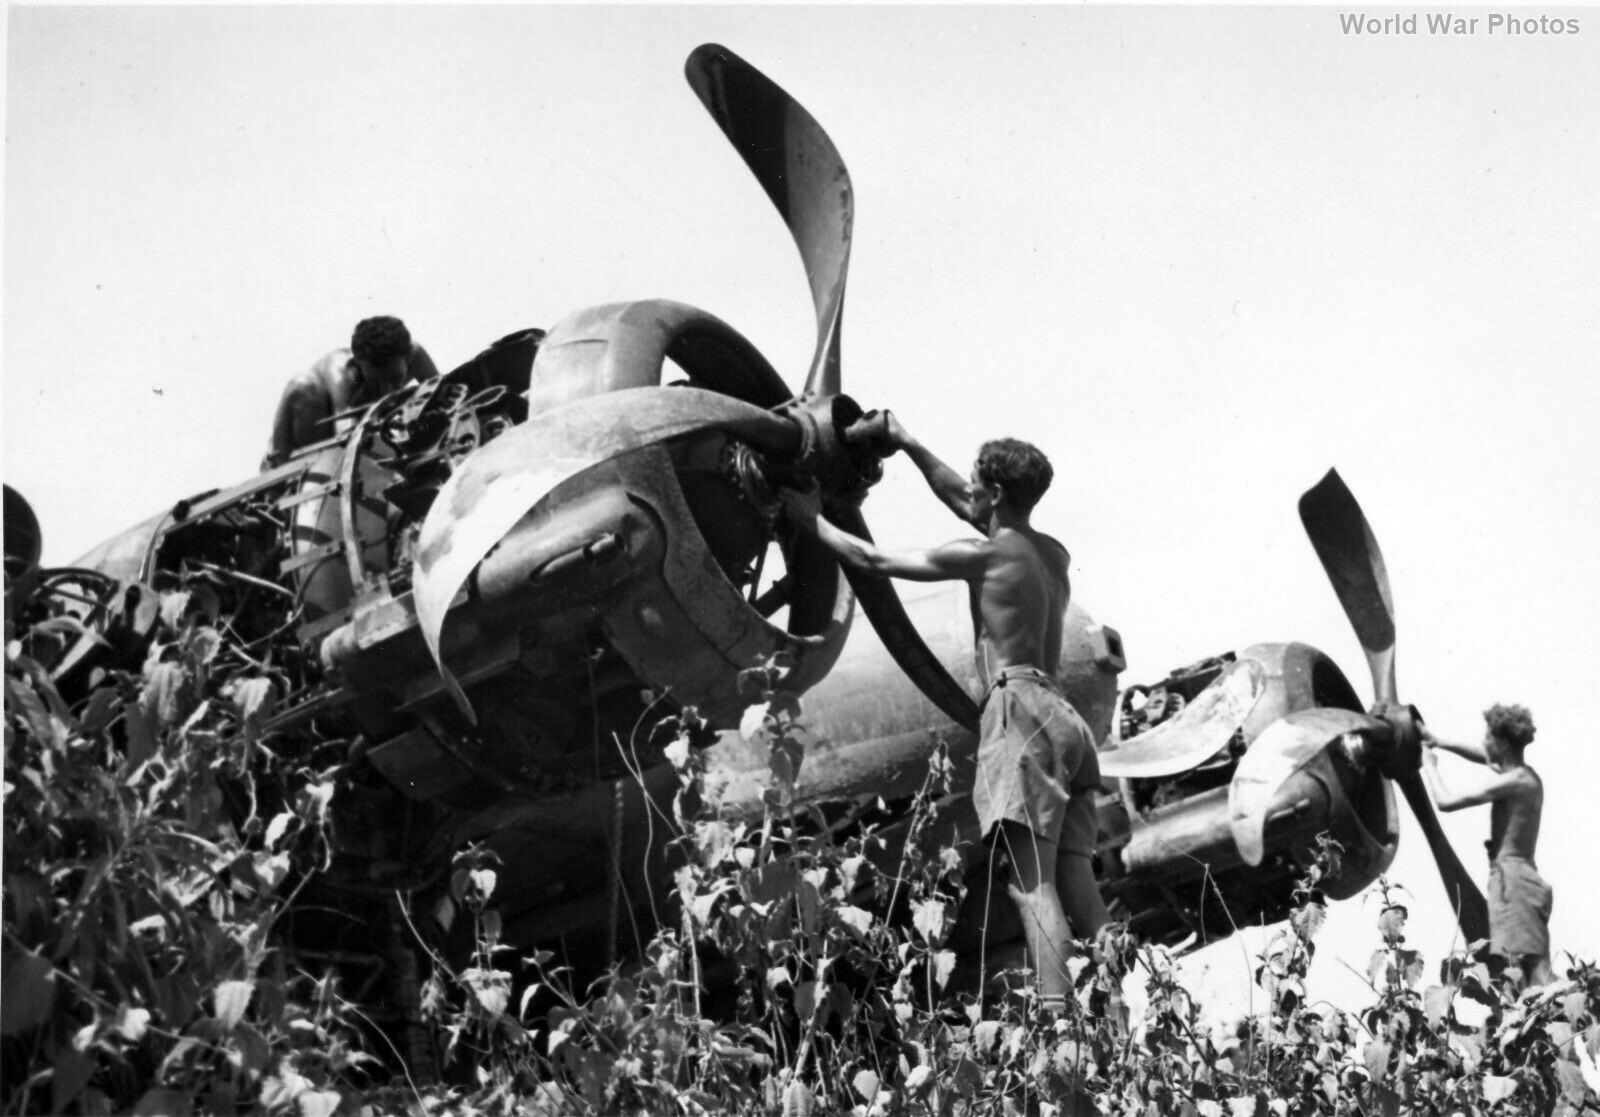 Bristol Beaufighter VIF Burma